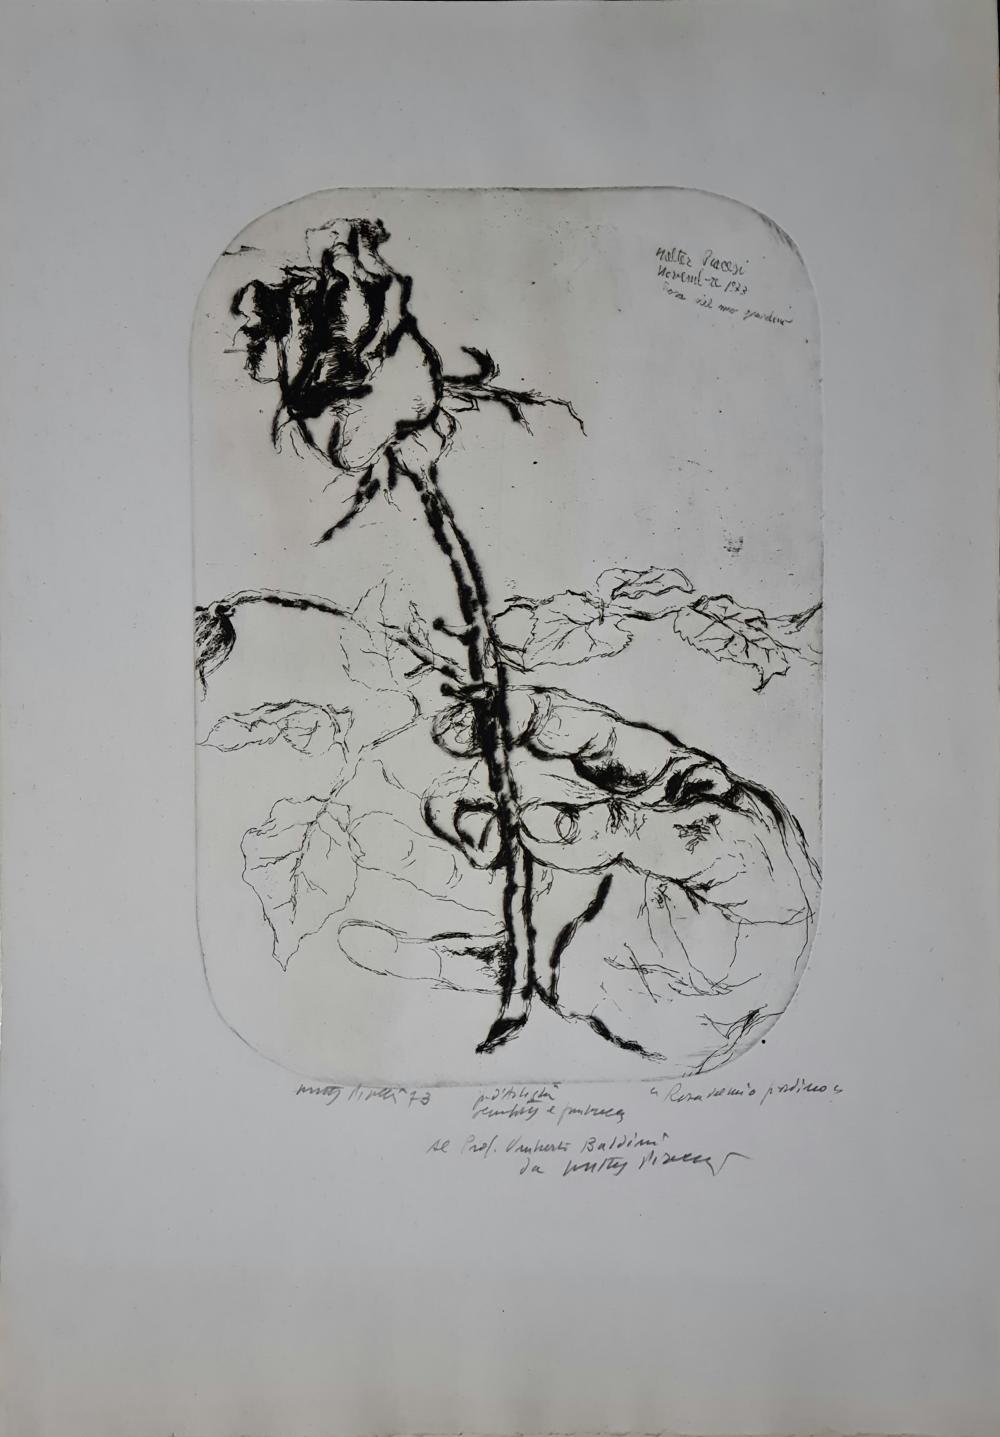 Piacesi Walter - La rosa, 1973